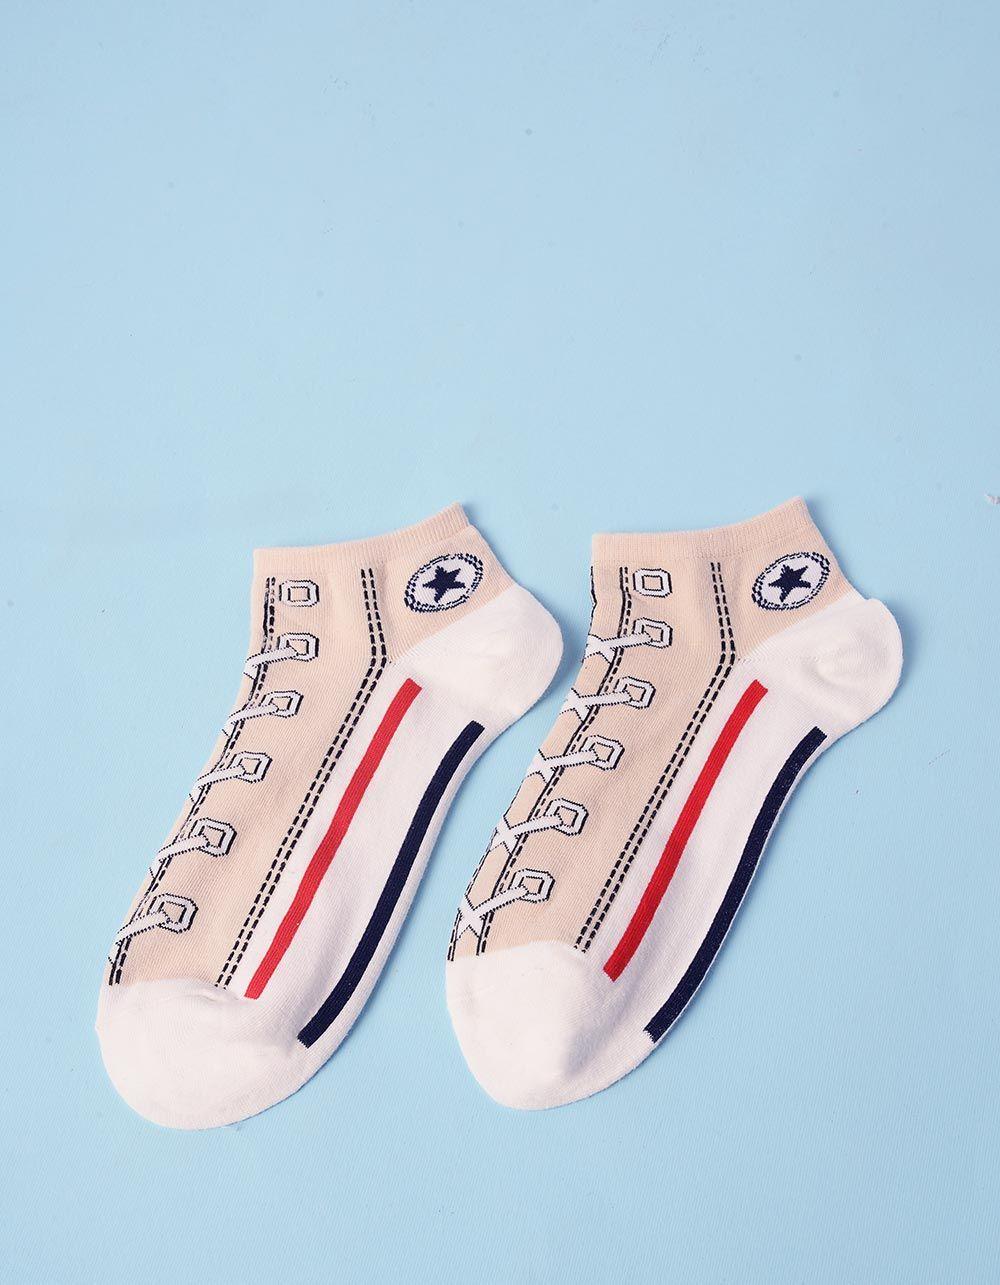 Шкарпетки з принтом кеди | 237639-22-XX